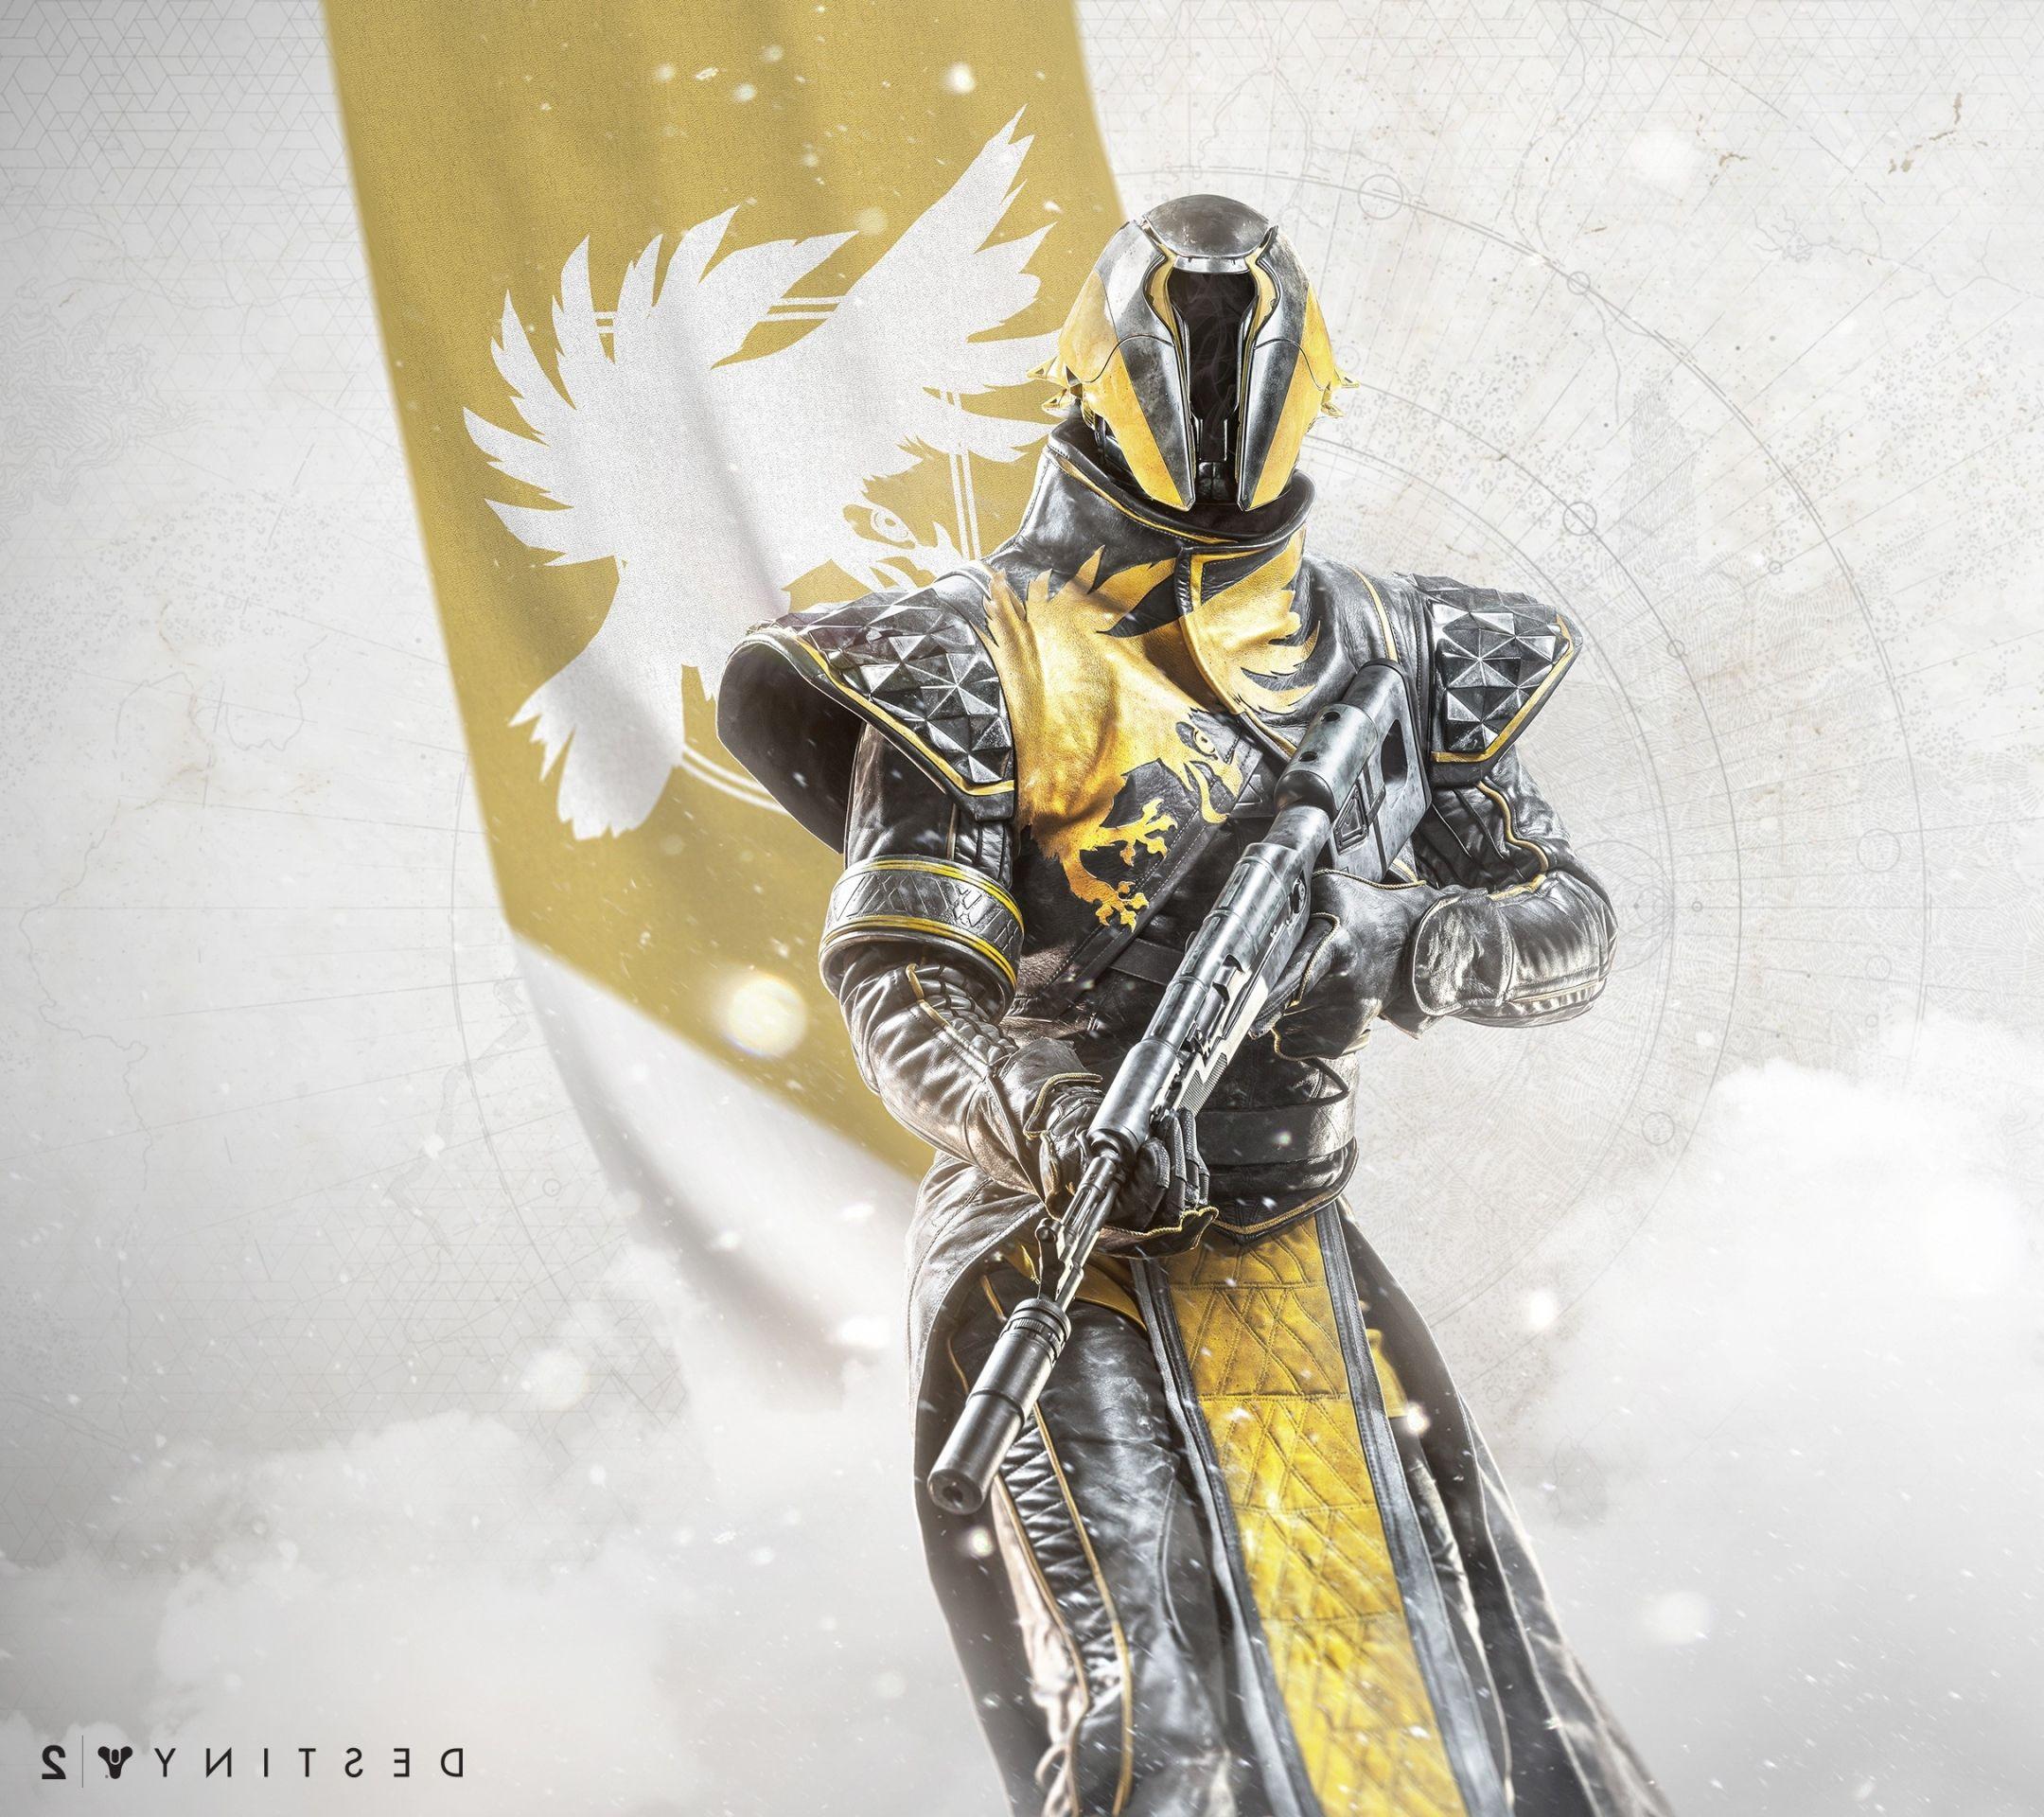 Destiny Wallpaper Hd in 2020 Destiny wallpaper hd